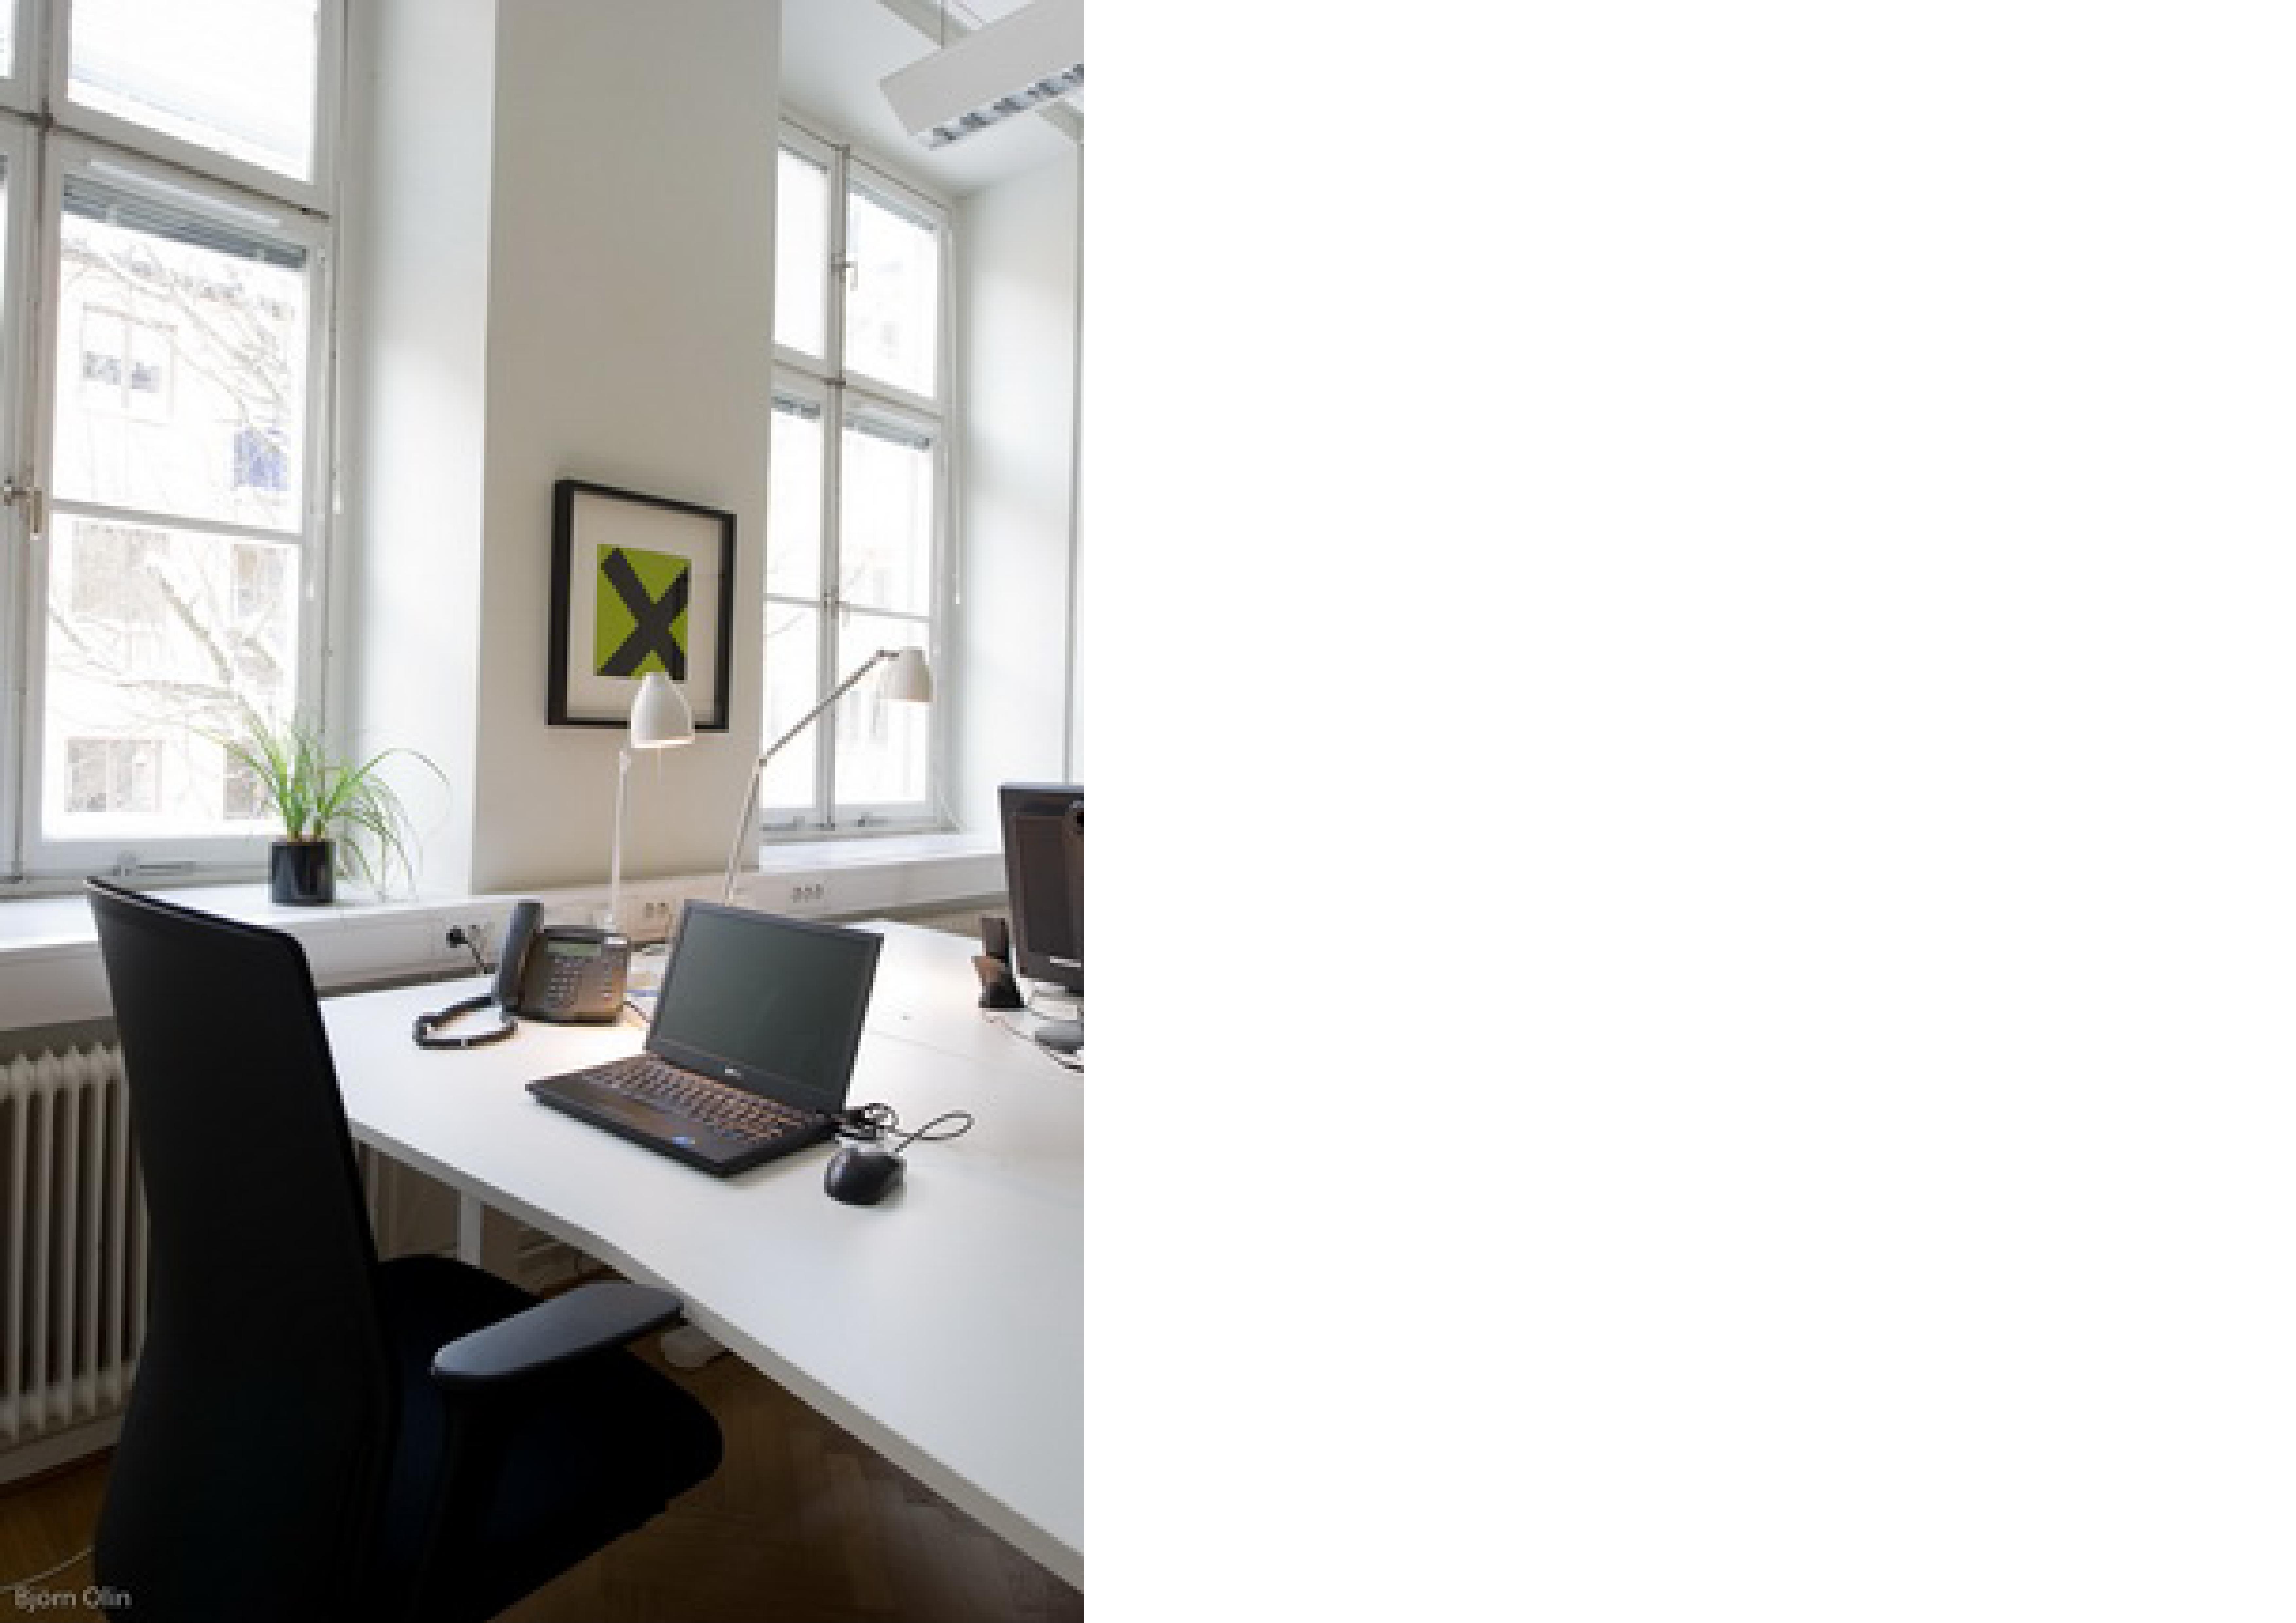 Inredning av f̦retag, kontor, offentlig milj̦ Рinredningsakuten ...